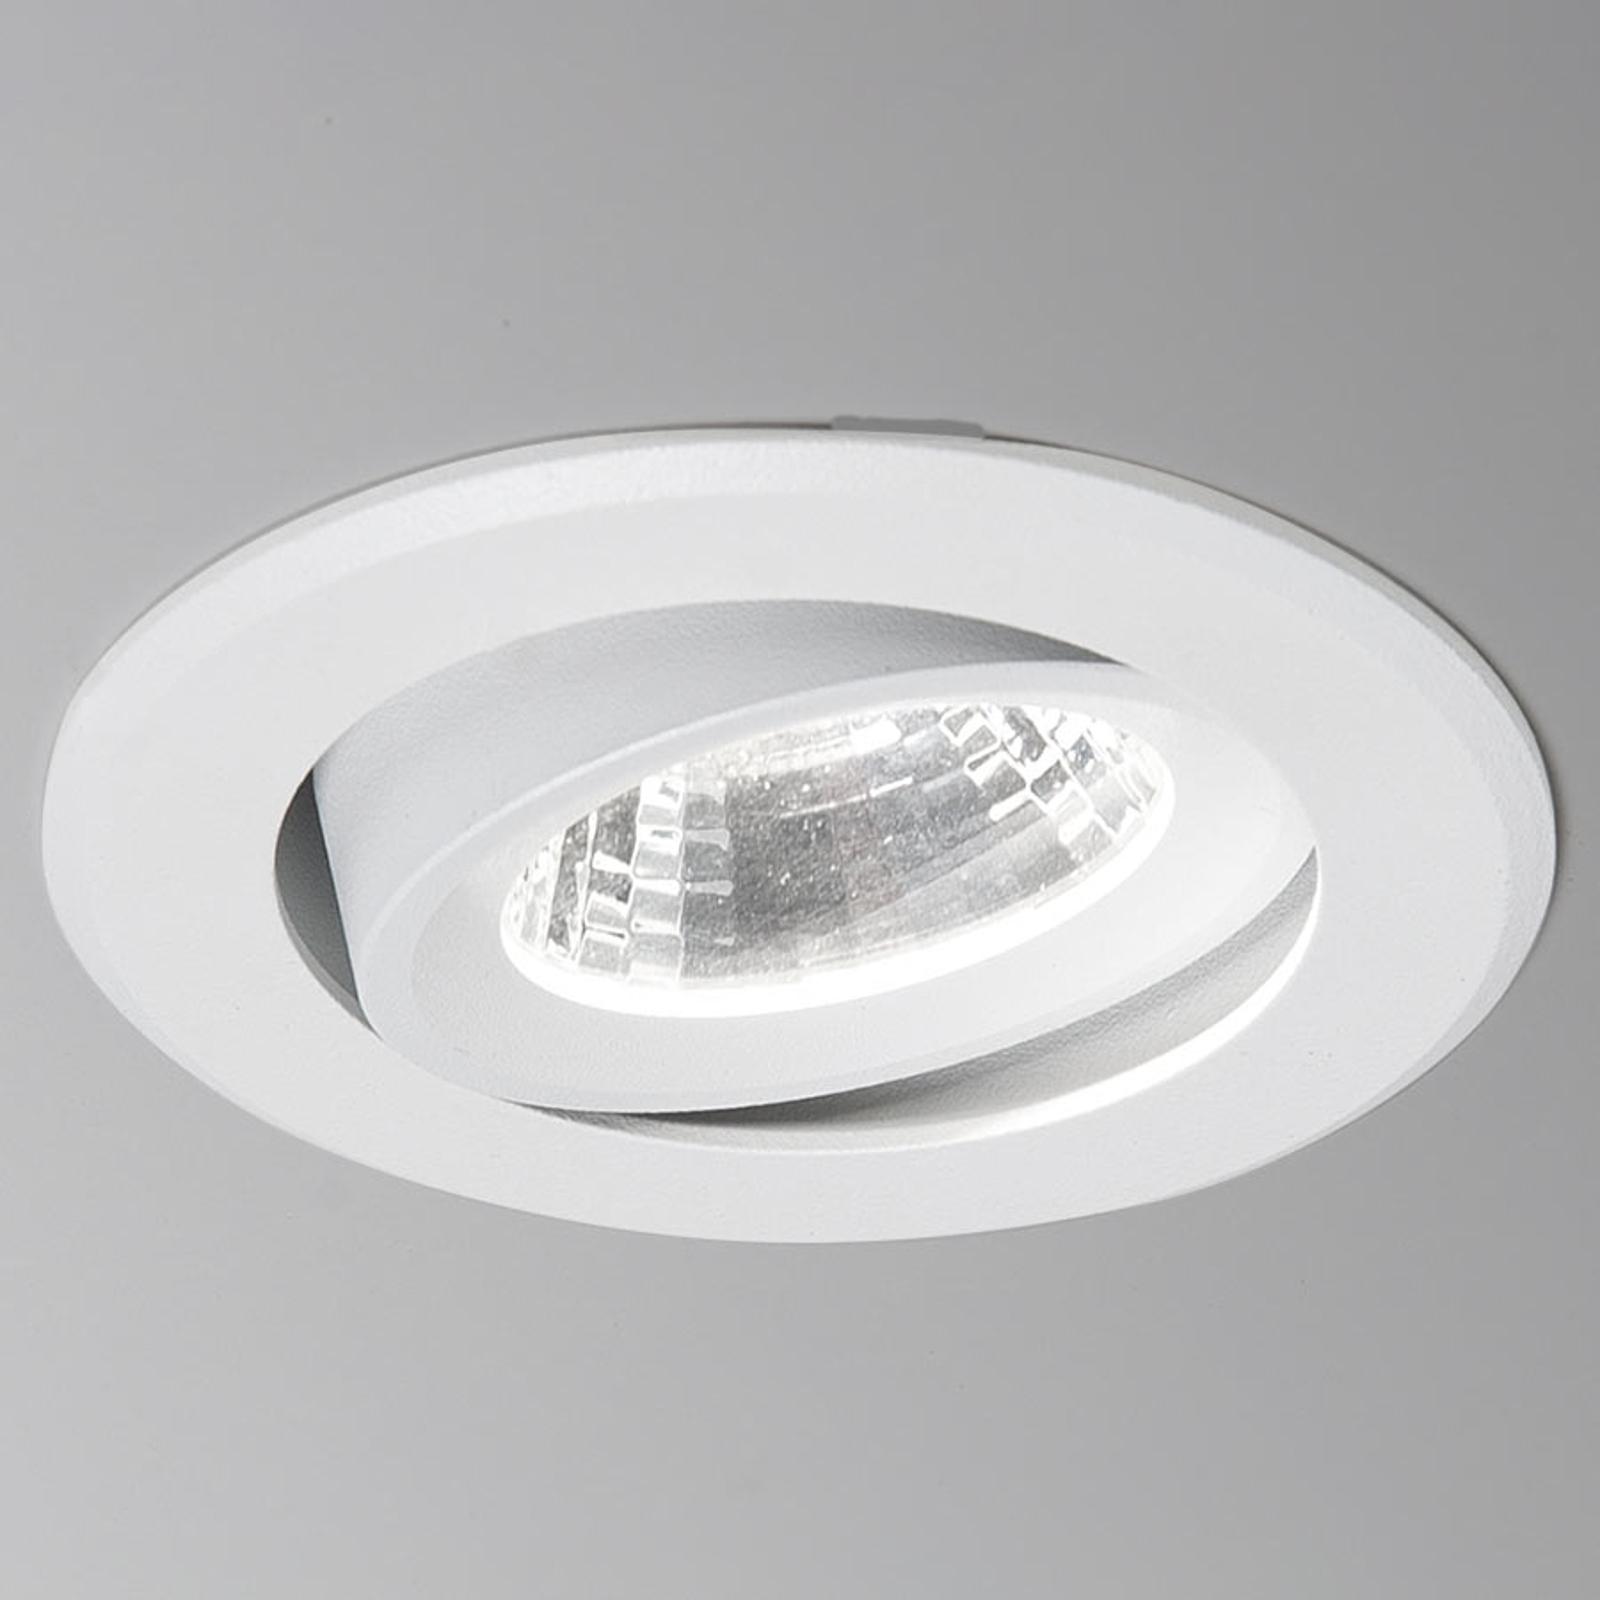 Agon Round spot encastrable LED 3000K 40° blanc